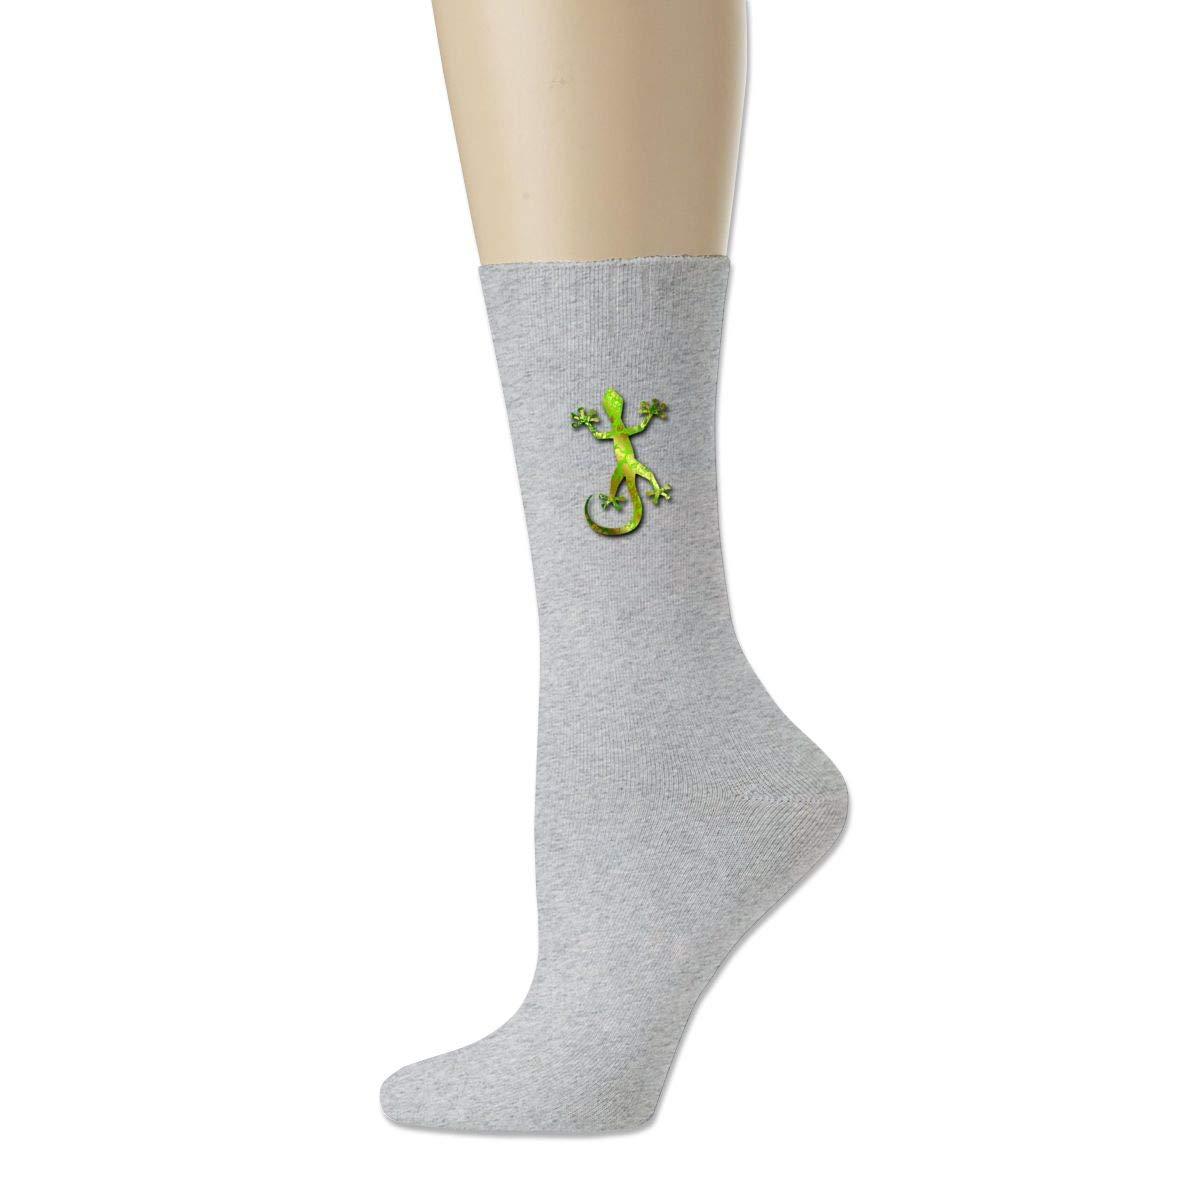 Green Yellow Lizard Crew Sock Cotton Funny Solid Socks Women